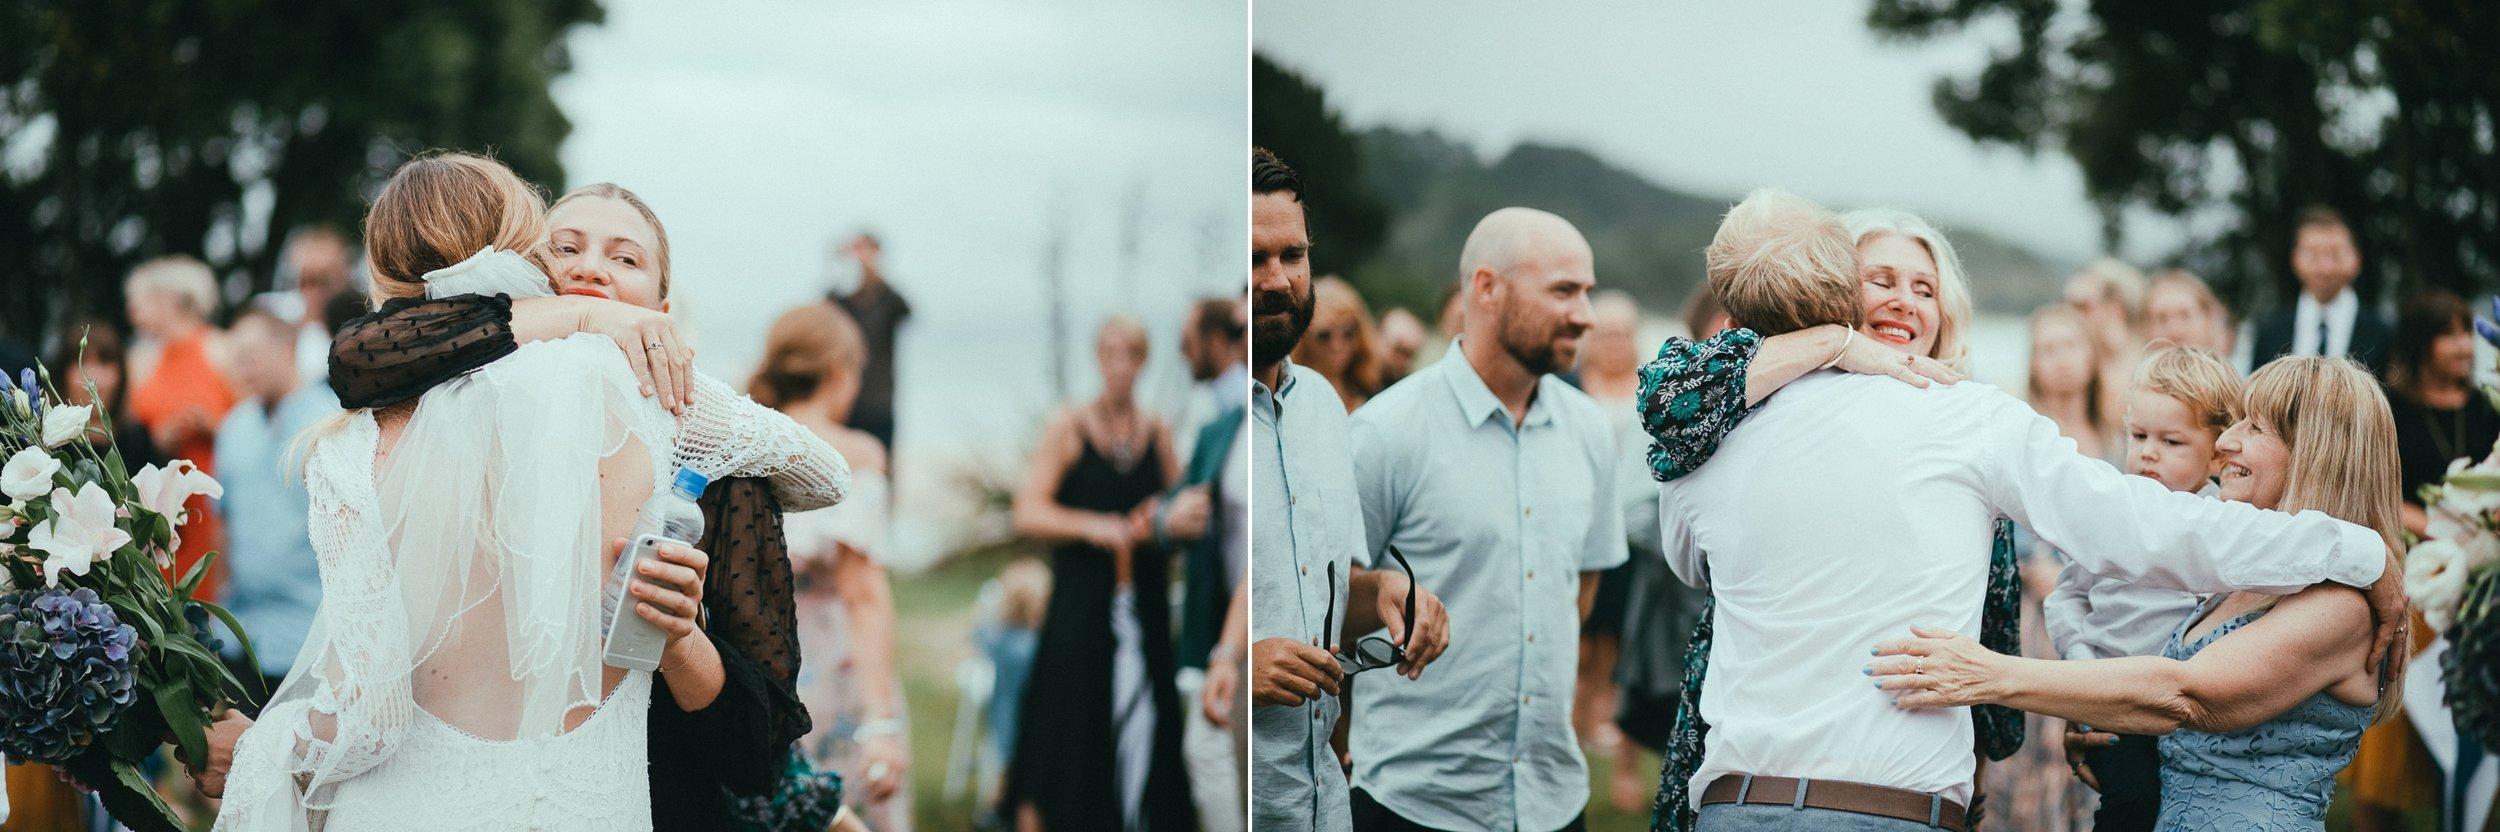 emotional-wedding-new-zealand90.jpg